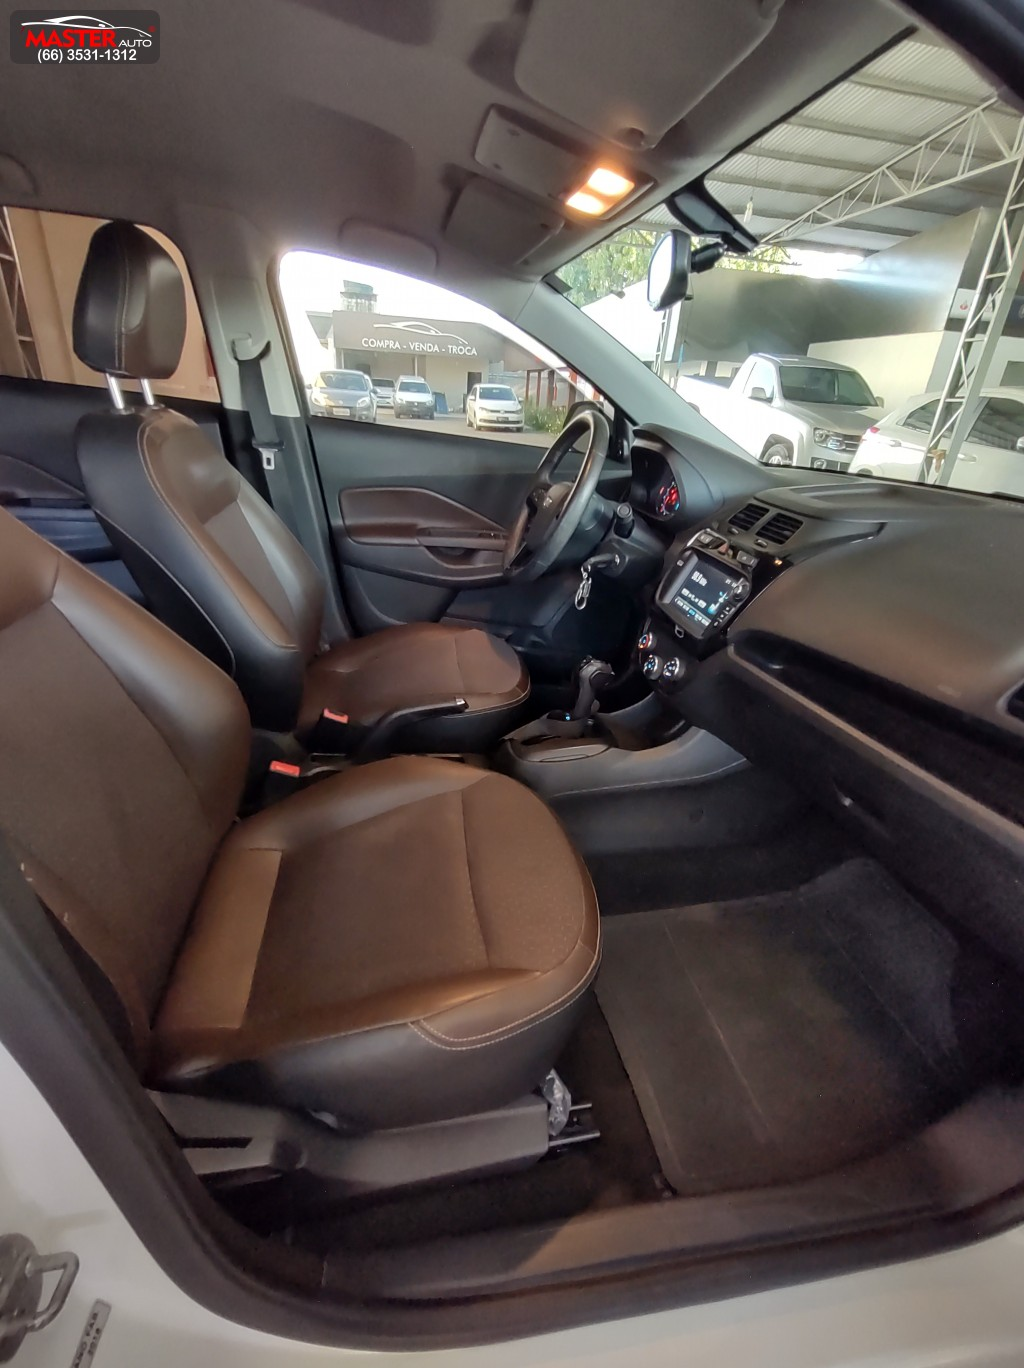 GM - Chevrolet COBALT LTZ 1.8 8V Econo.Flex 4p Aut. 2019